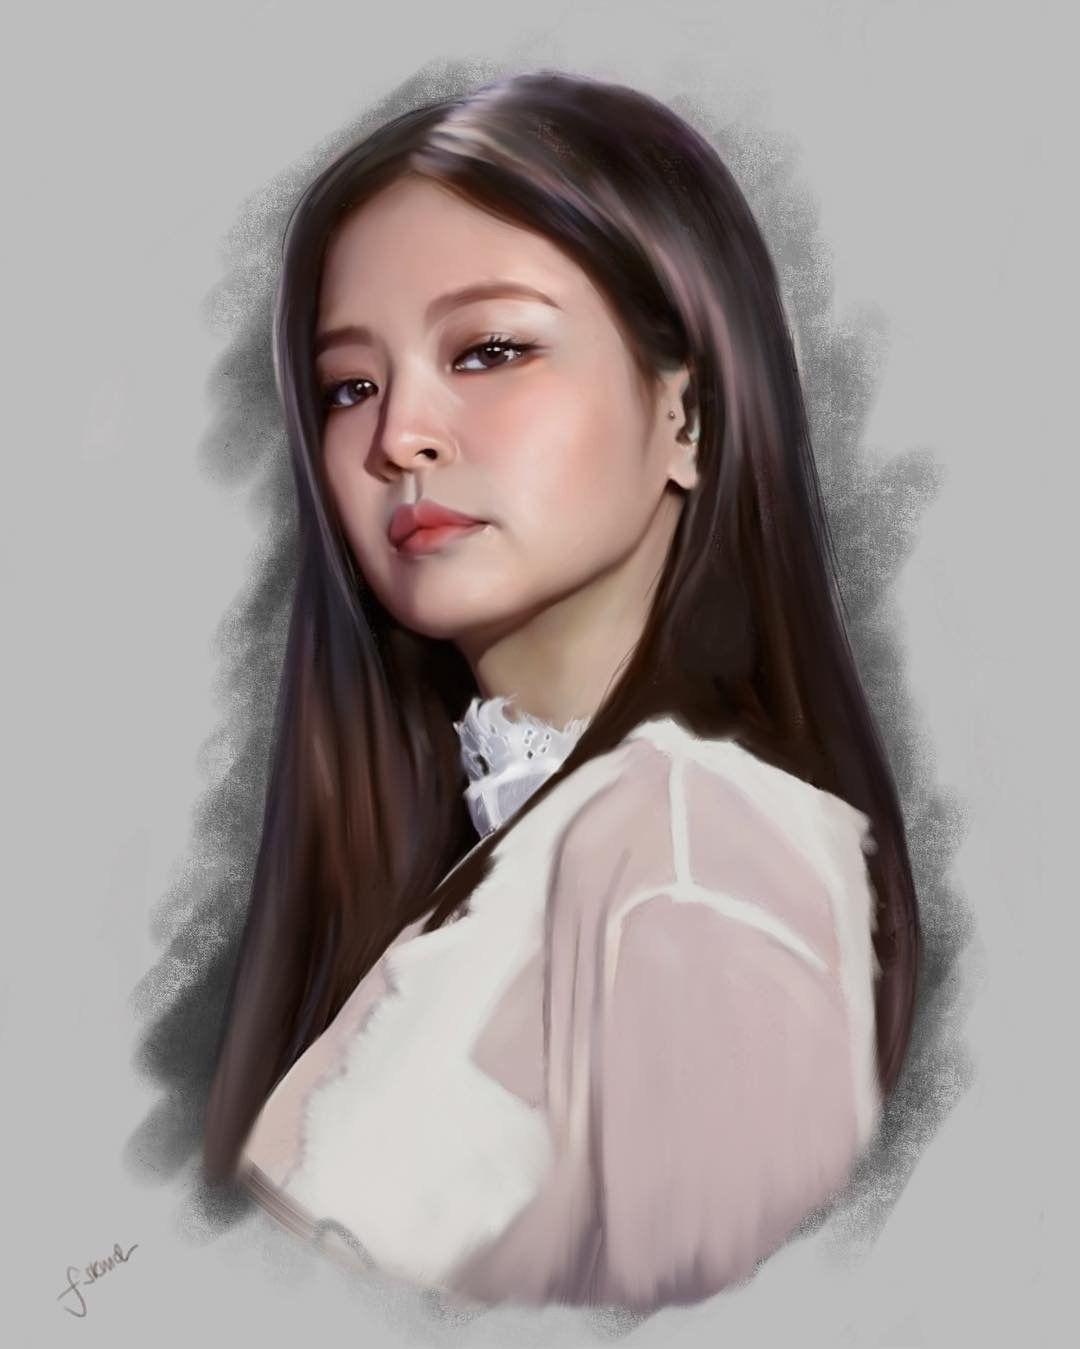 Pin by YSA on Jennie | Black pink kpop, Blackpink, Pink art